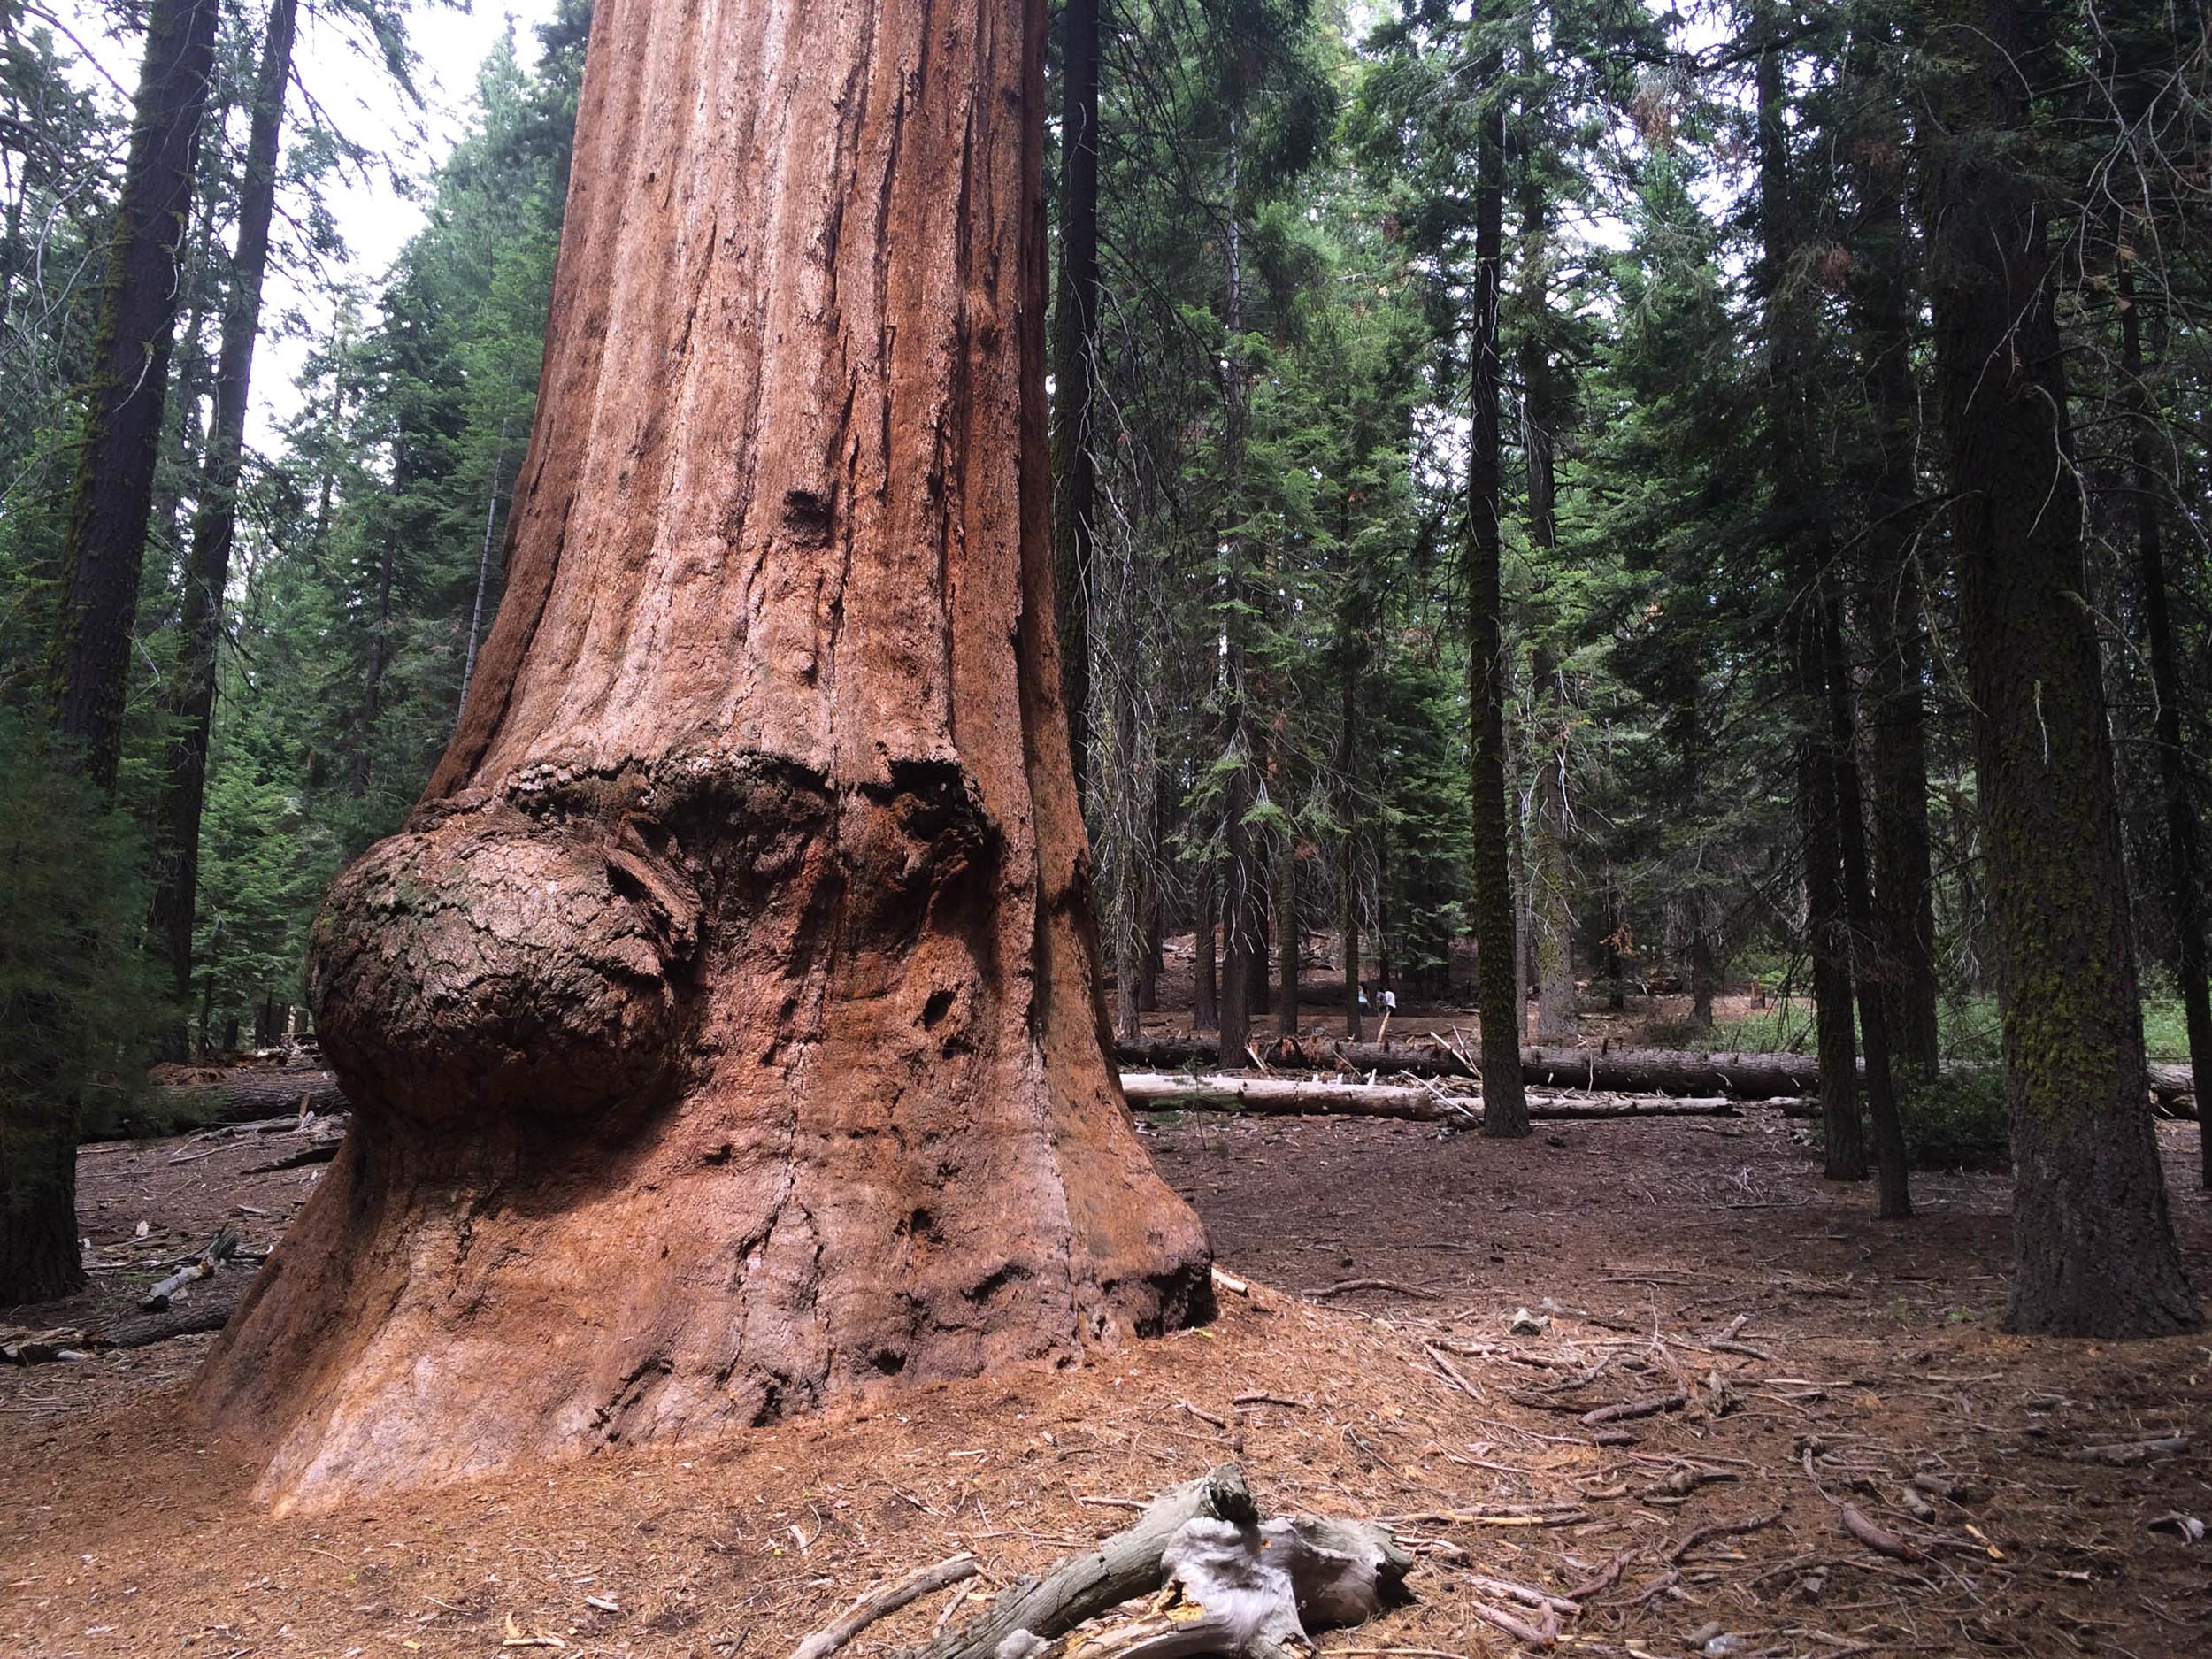 Kelly_Megan_NationalParks_Sequoia_1.jpg